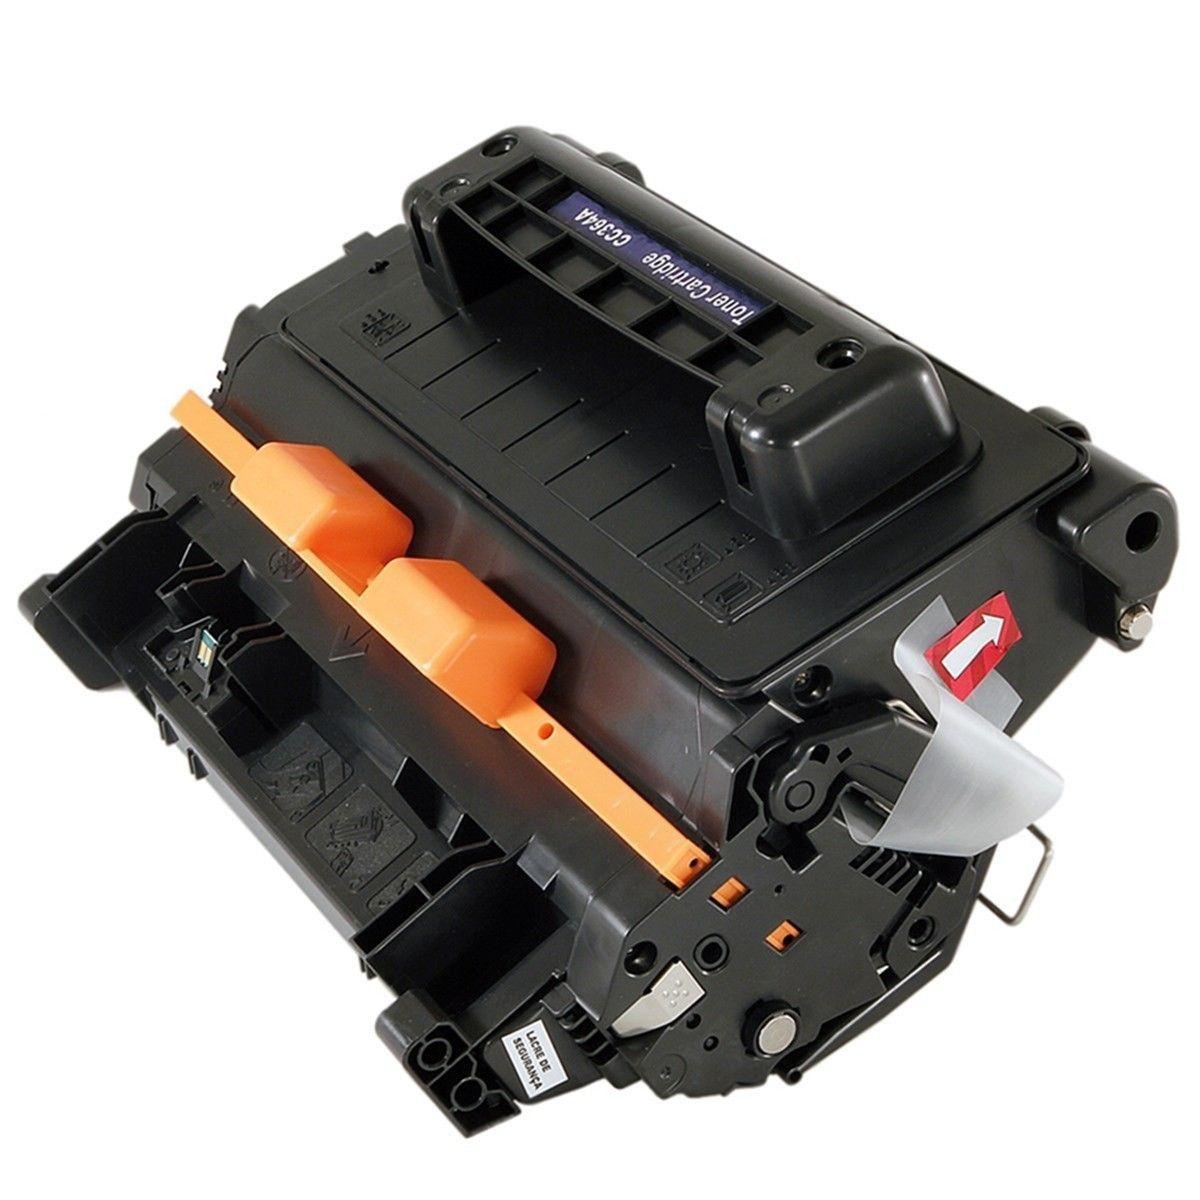 TONER HP 364 X/390 X 24K - (P4014/P4015/600/M4555) - COMP BY